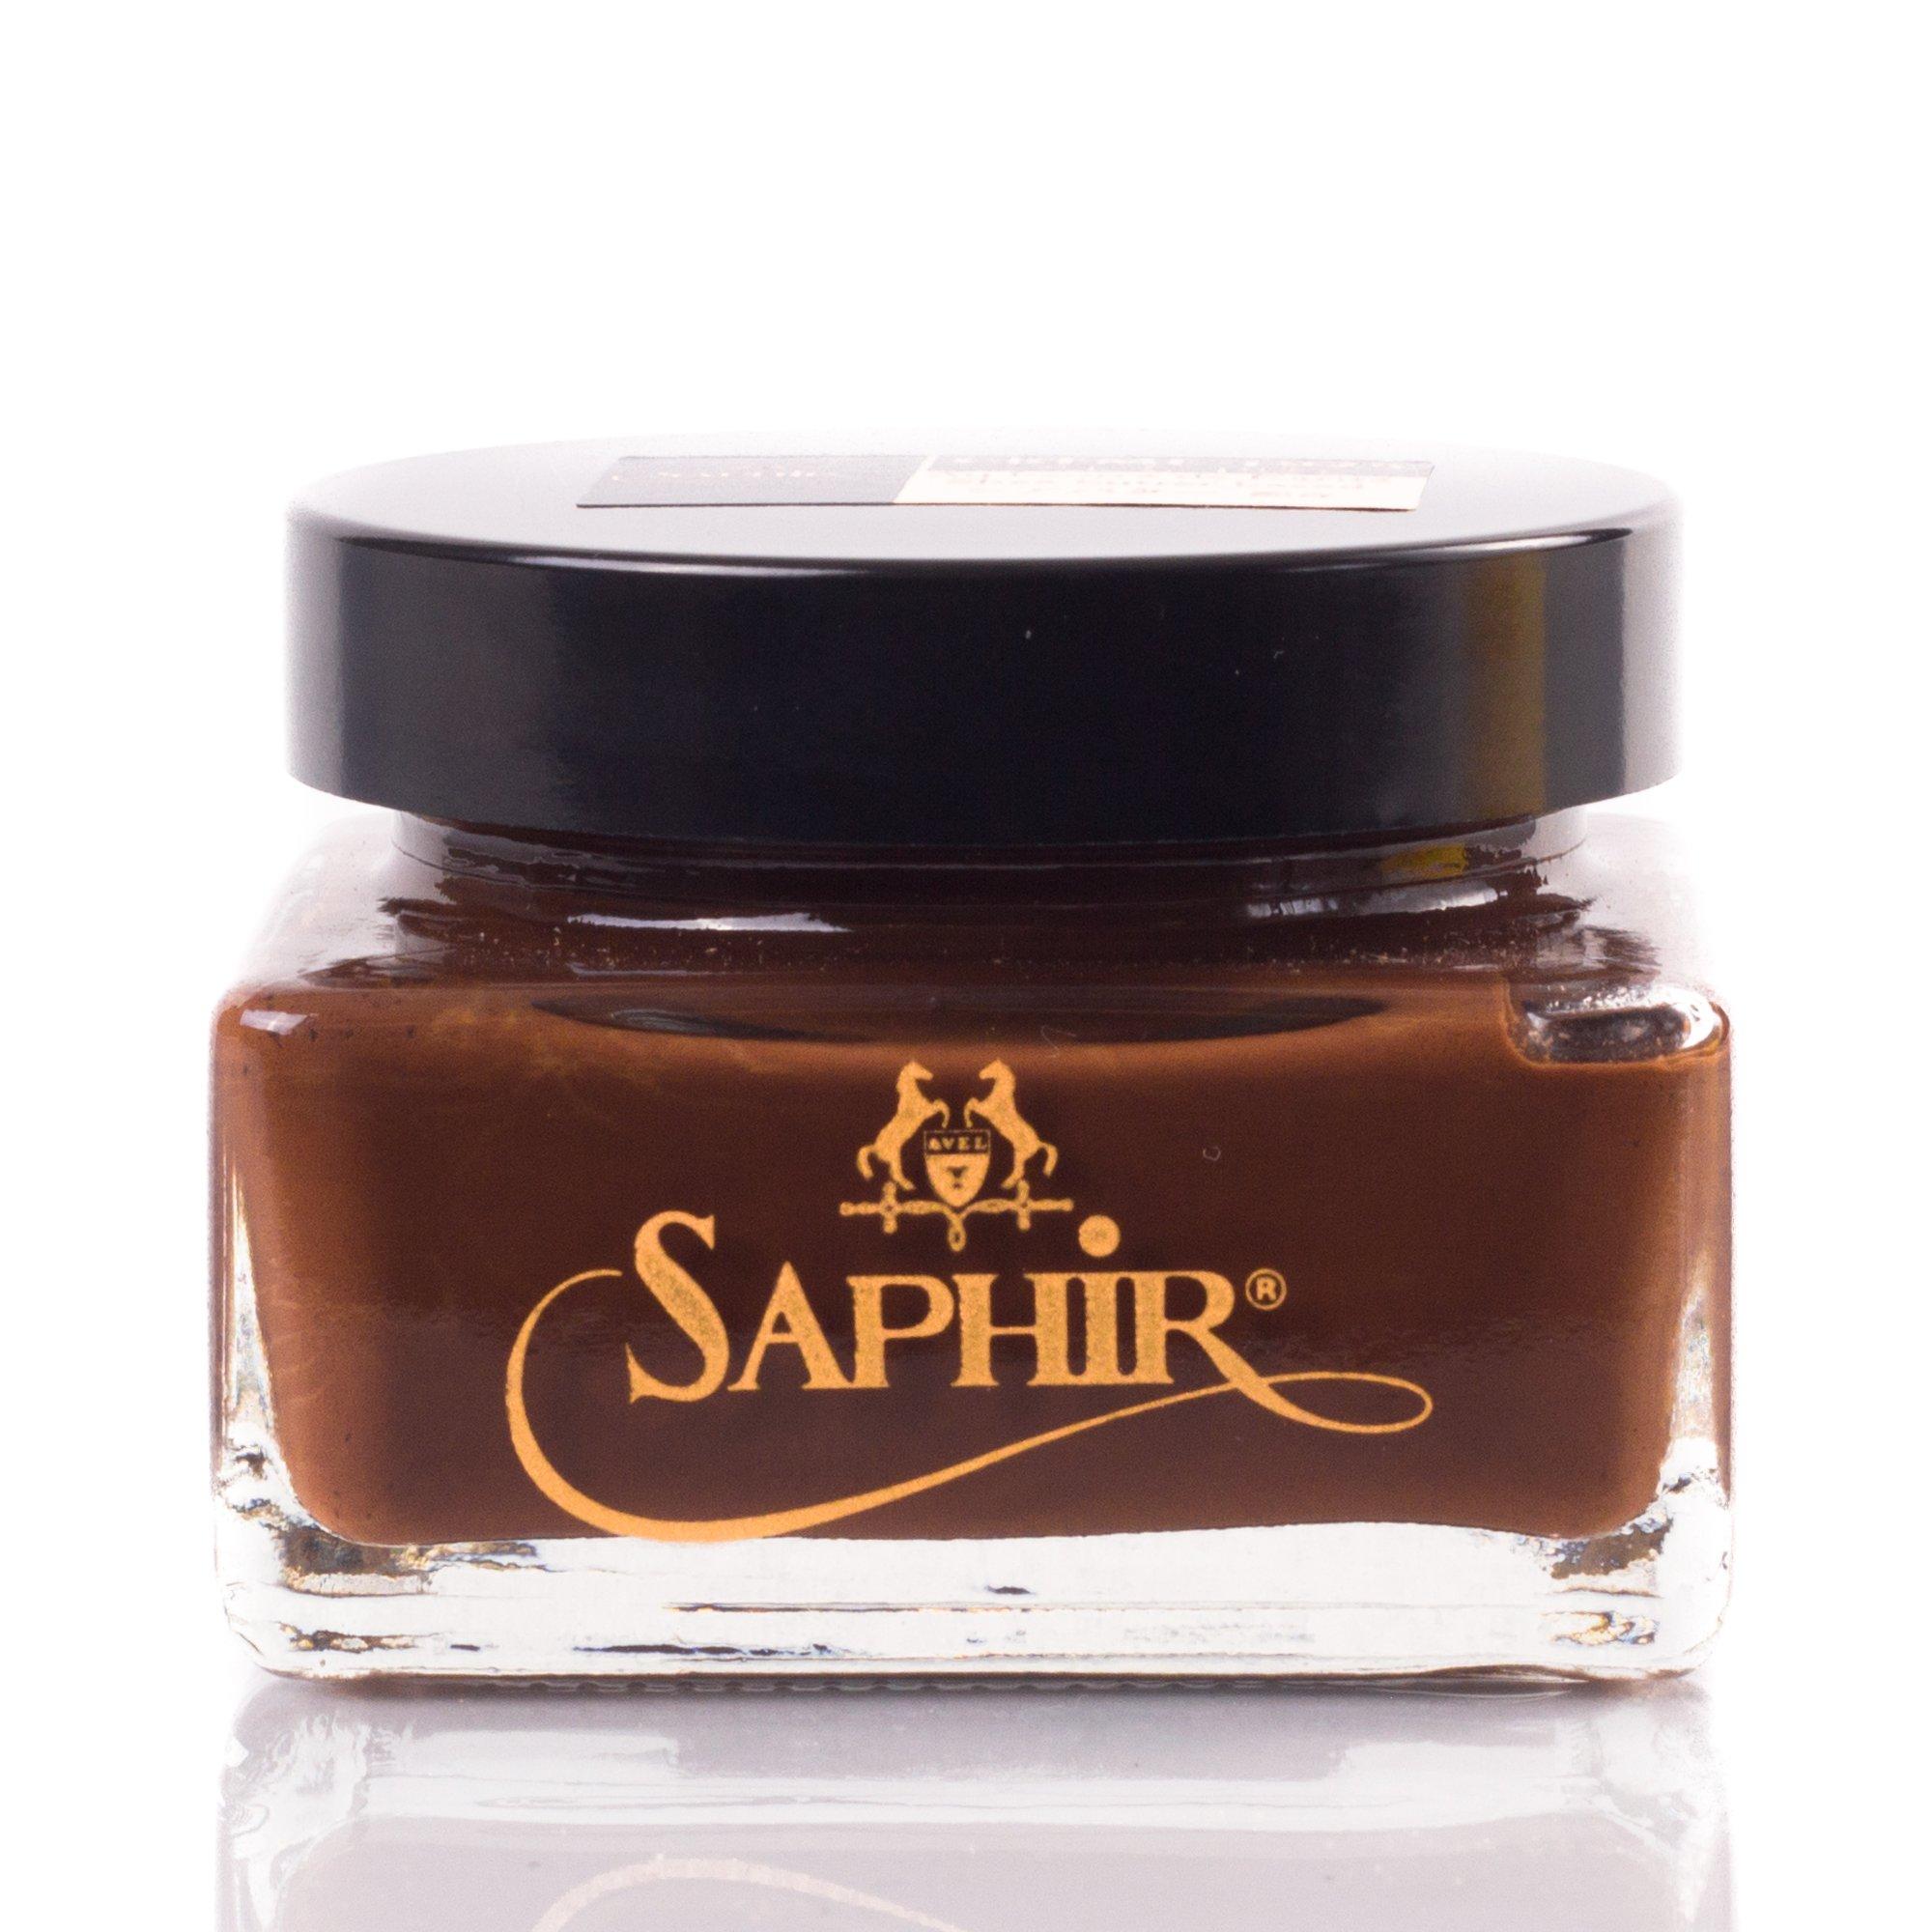 Saphir Pommadier Cream / Shoe Medium Brown Polish 75ml Medai